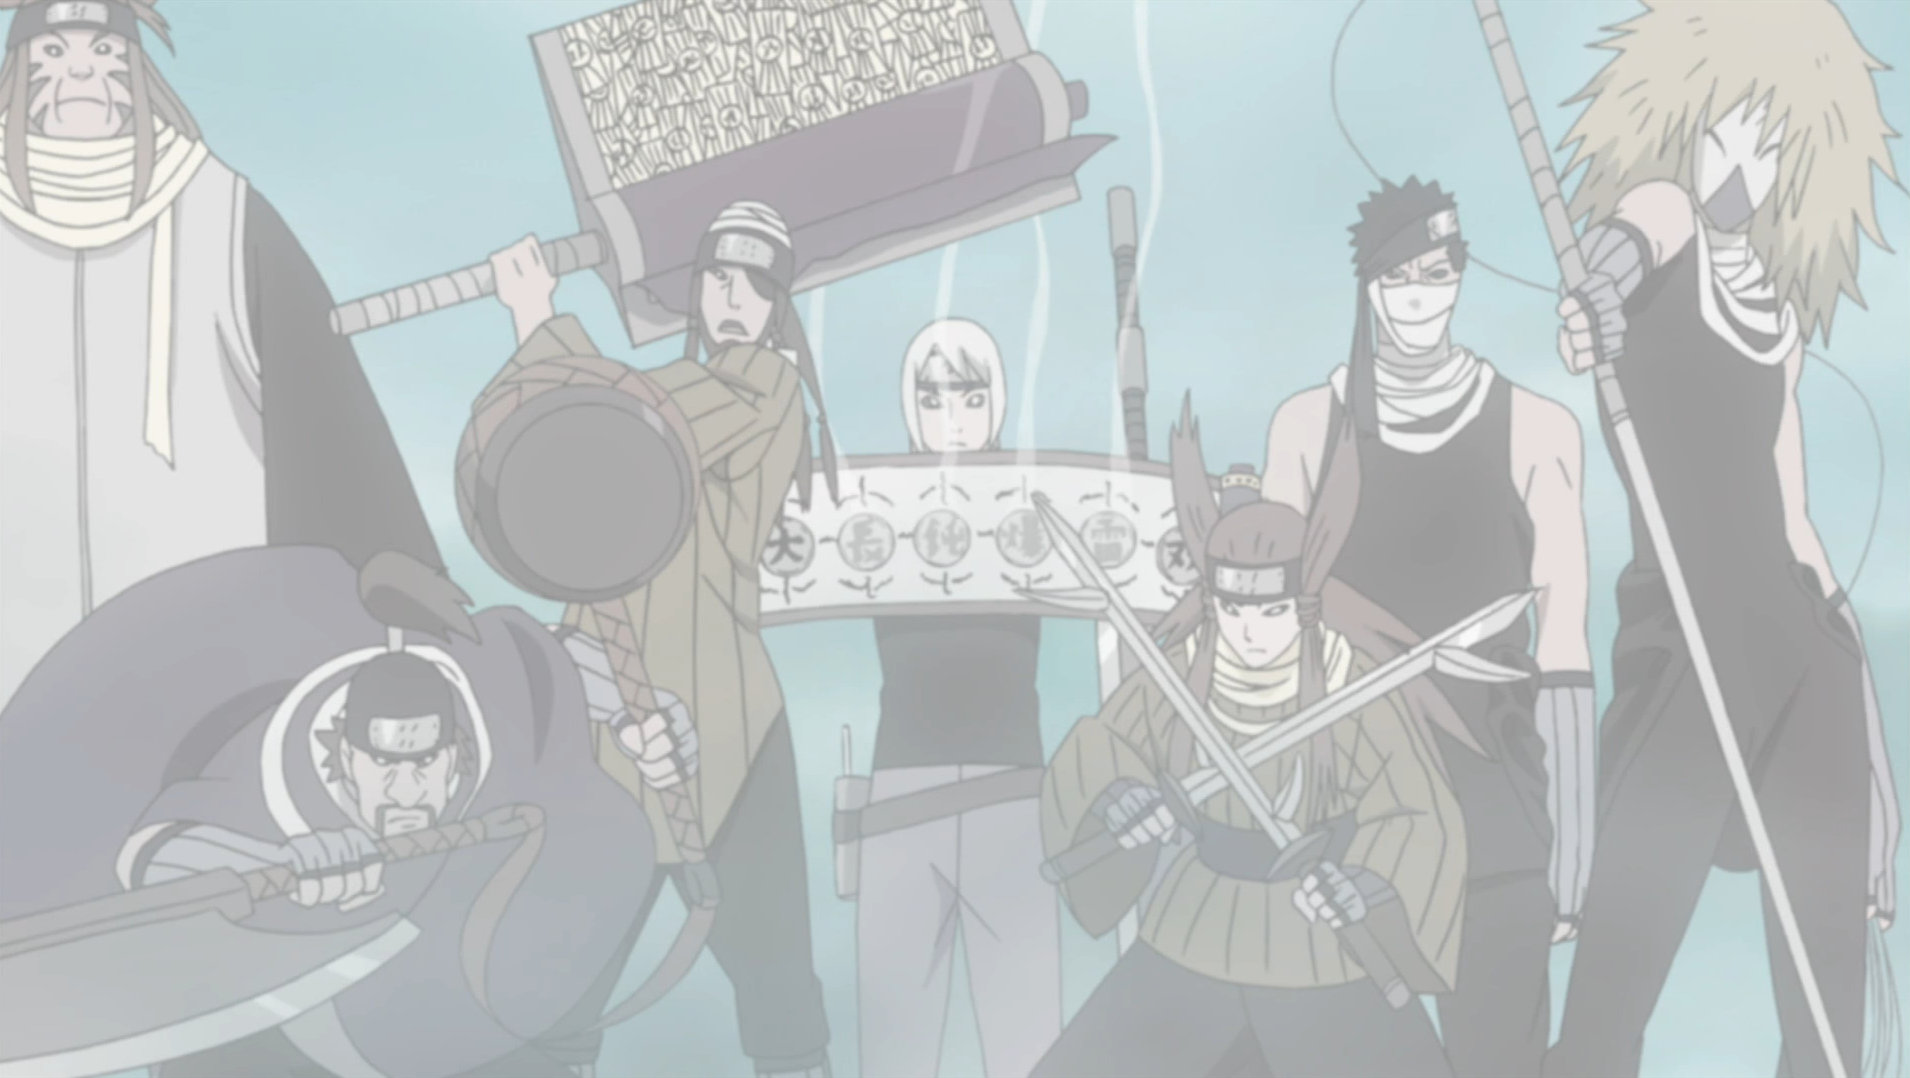 Seven Ninja Swordsmen of the Mist | Narutopedia | FANDOM powered by